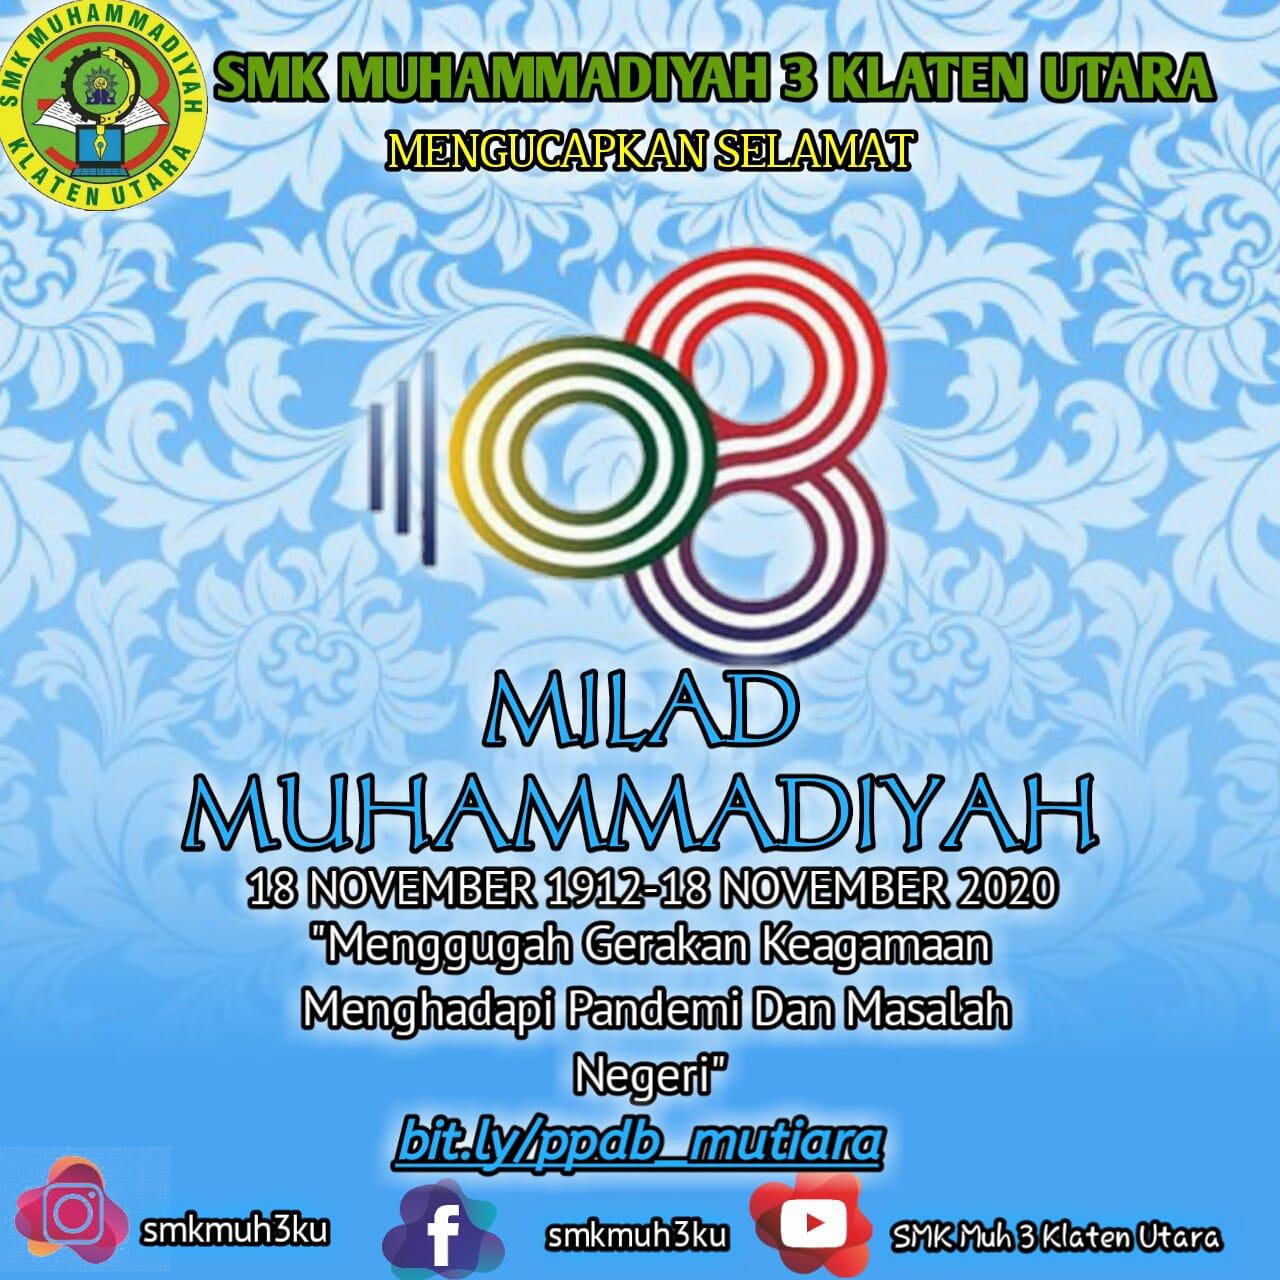 Selamat Milad Muhammadiyah